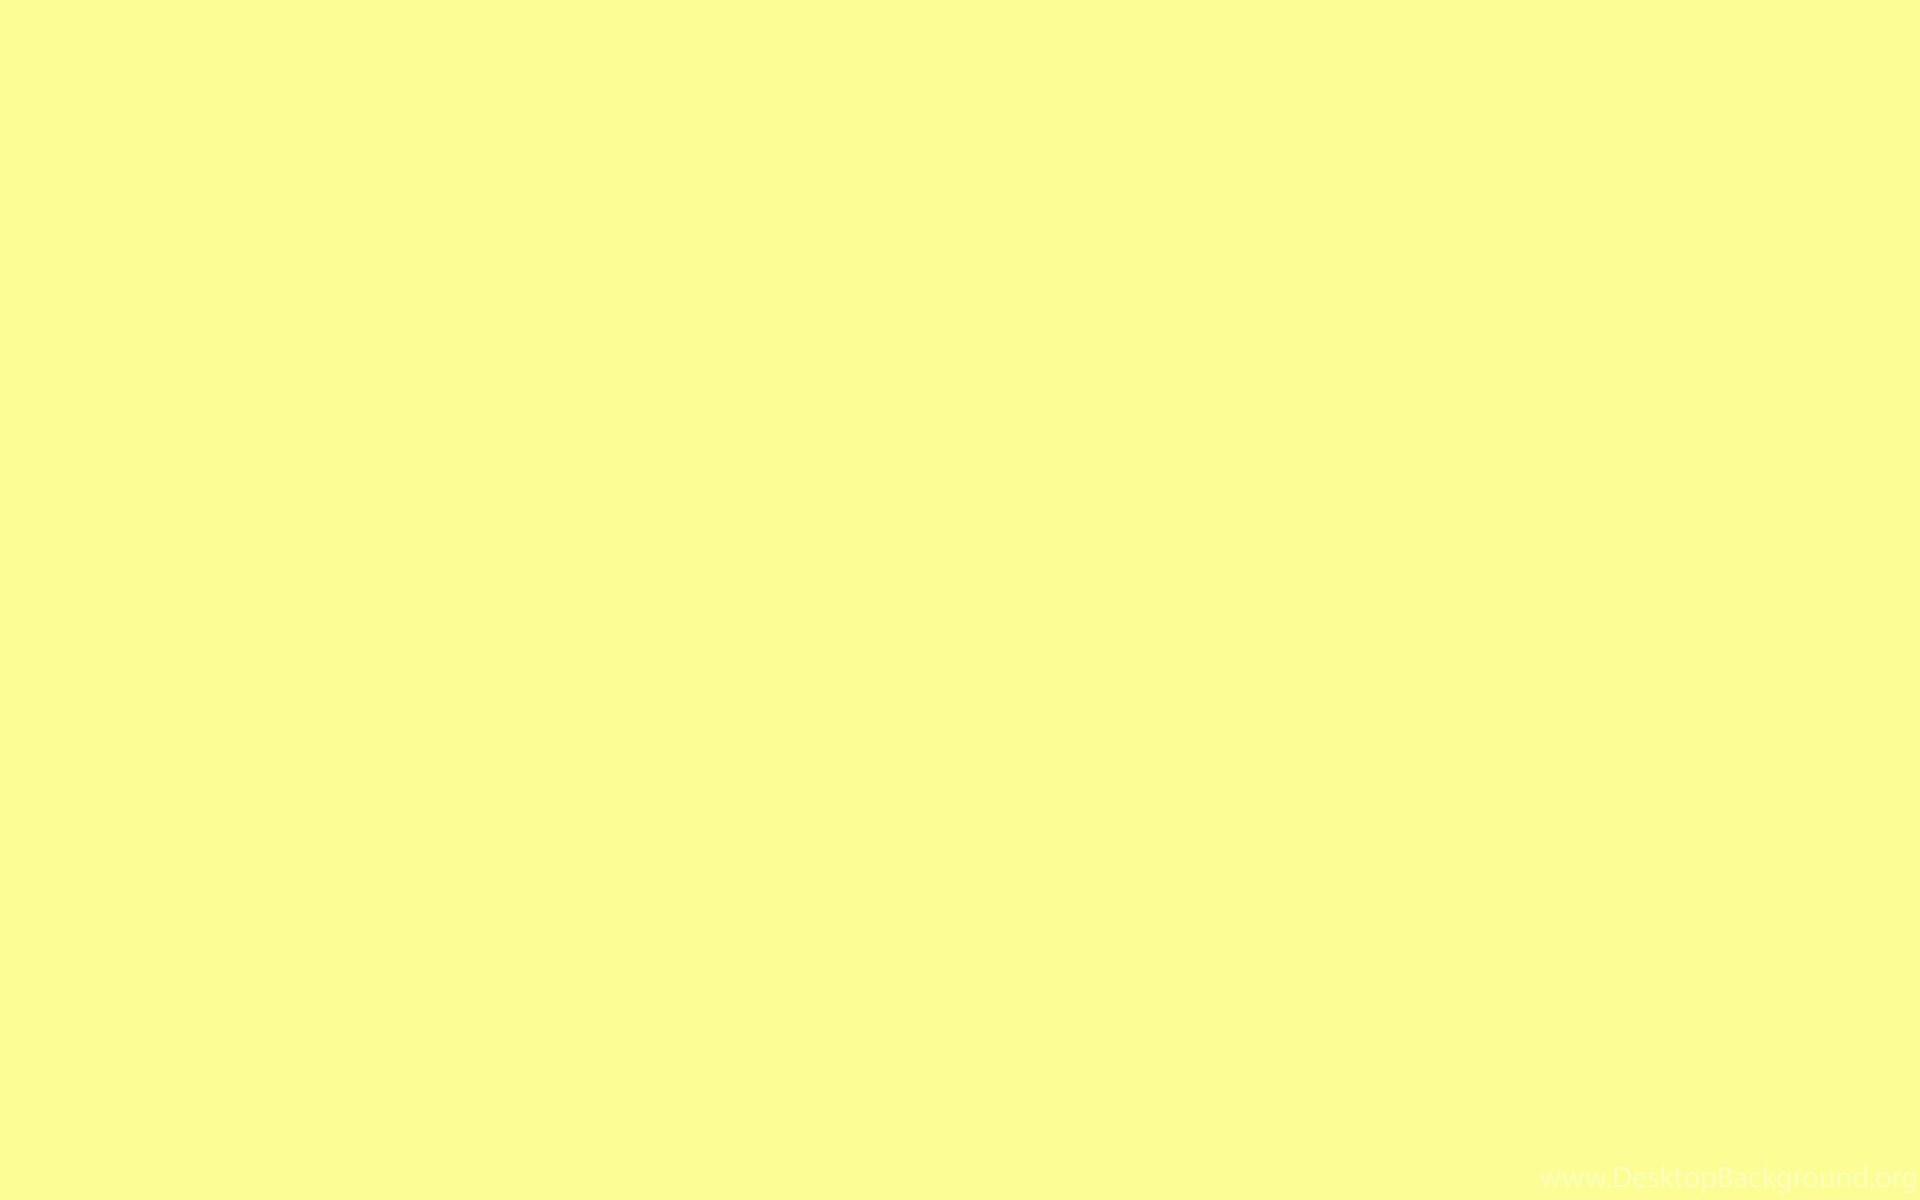 1920x1200 Pastel Yellow Solid Color Background.jpg Desktop